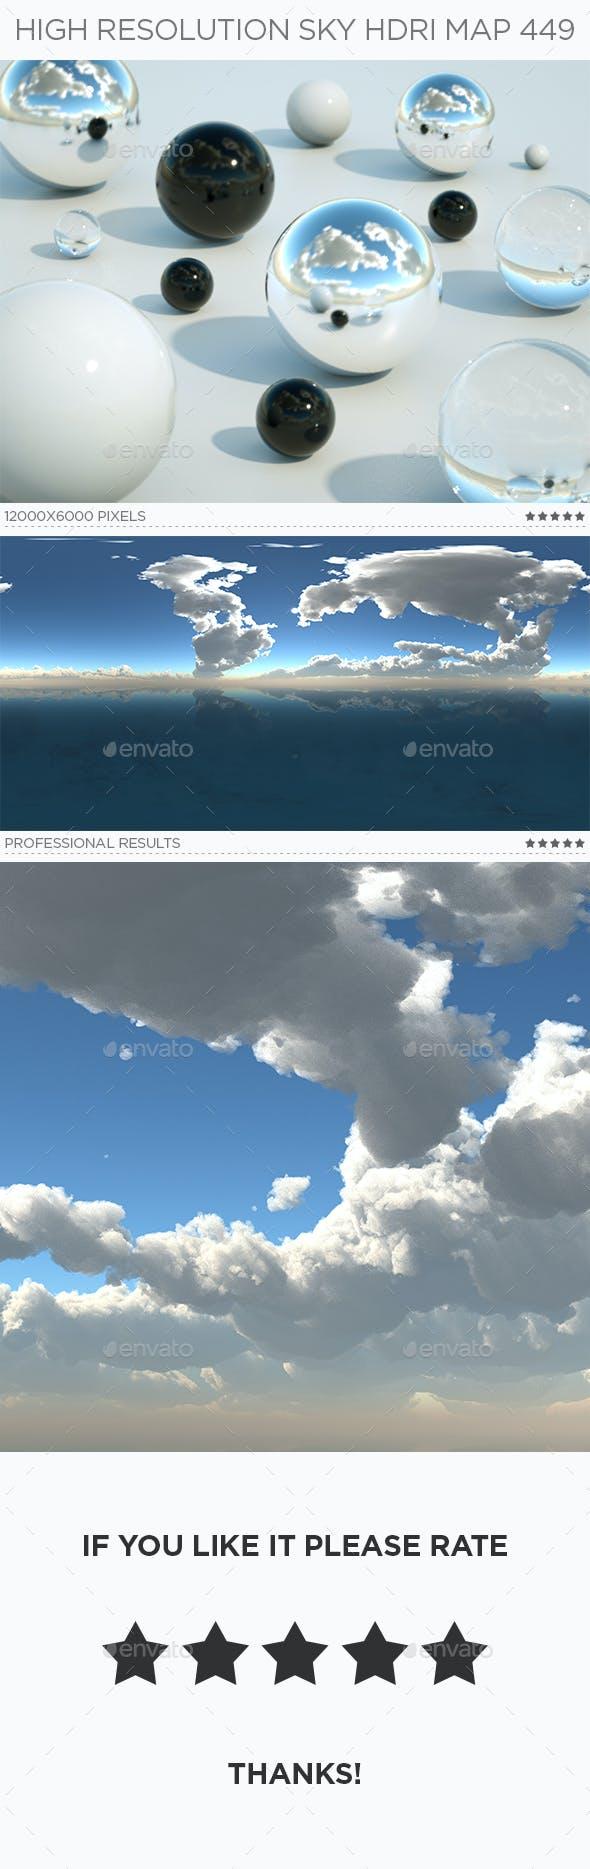 High Resolution Sky HDRi Map 449 - 3DOcean Item for Sale